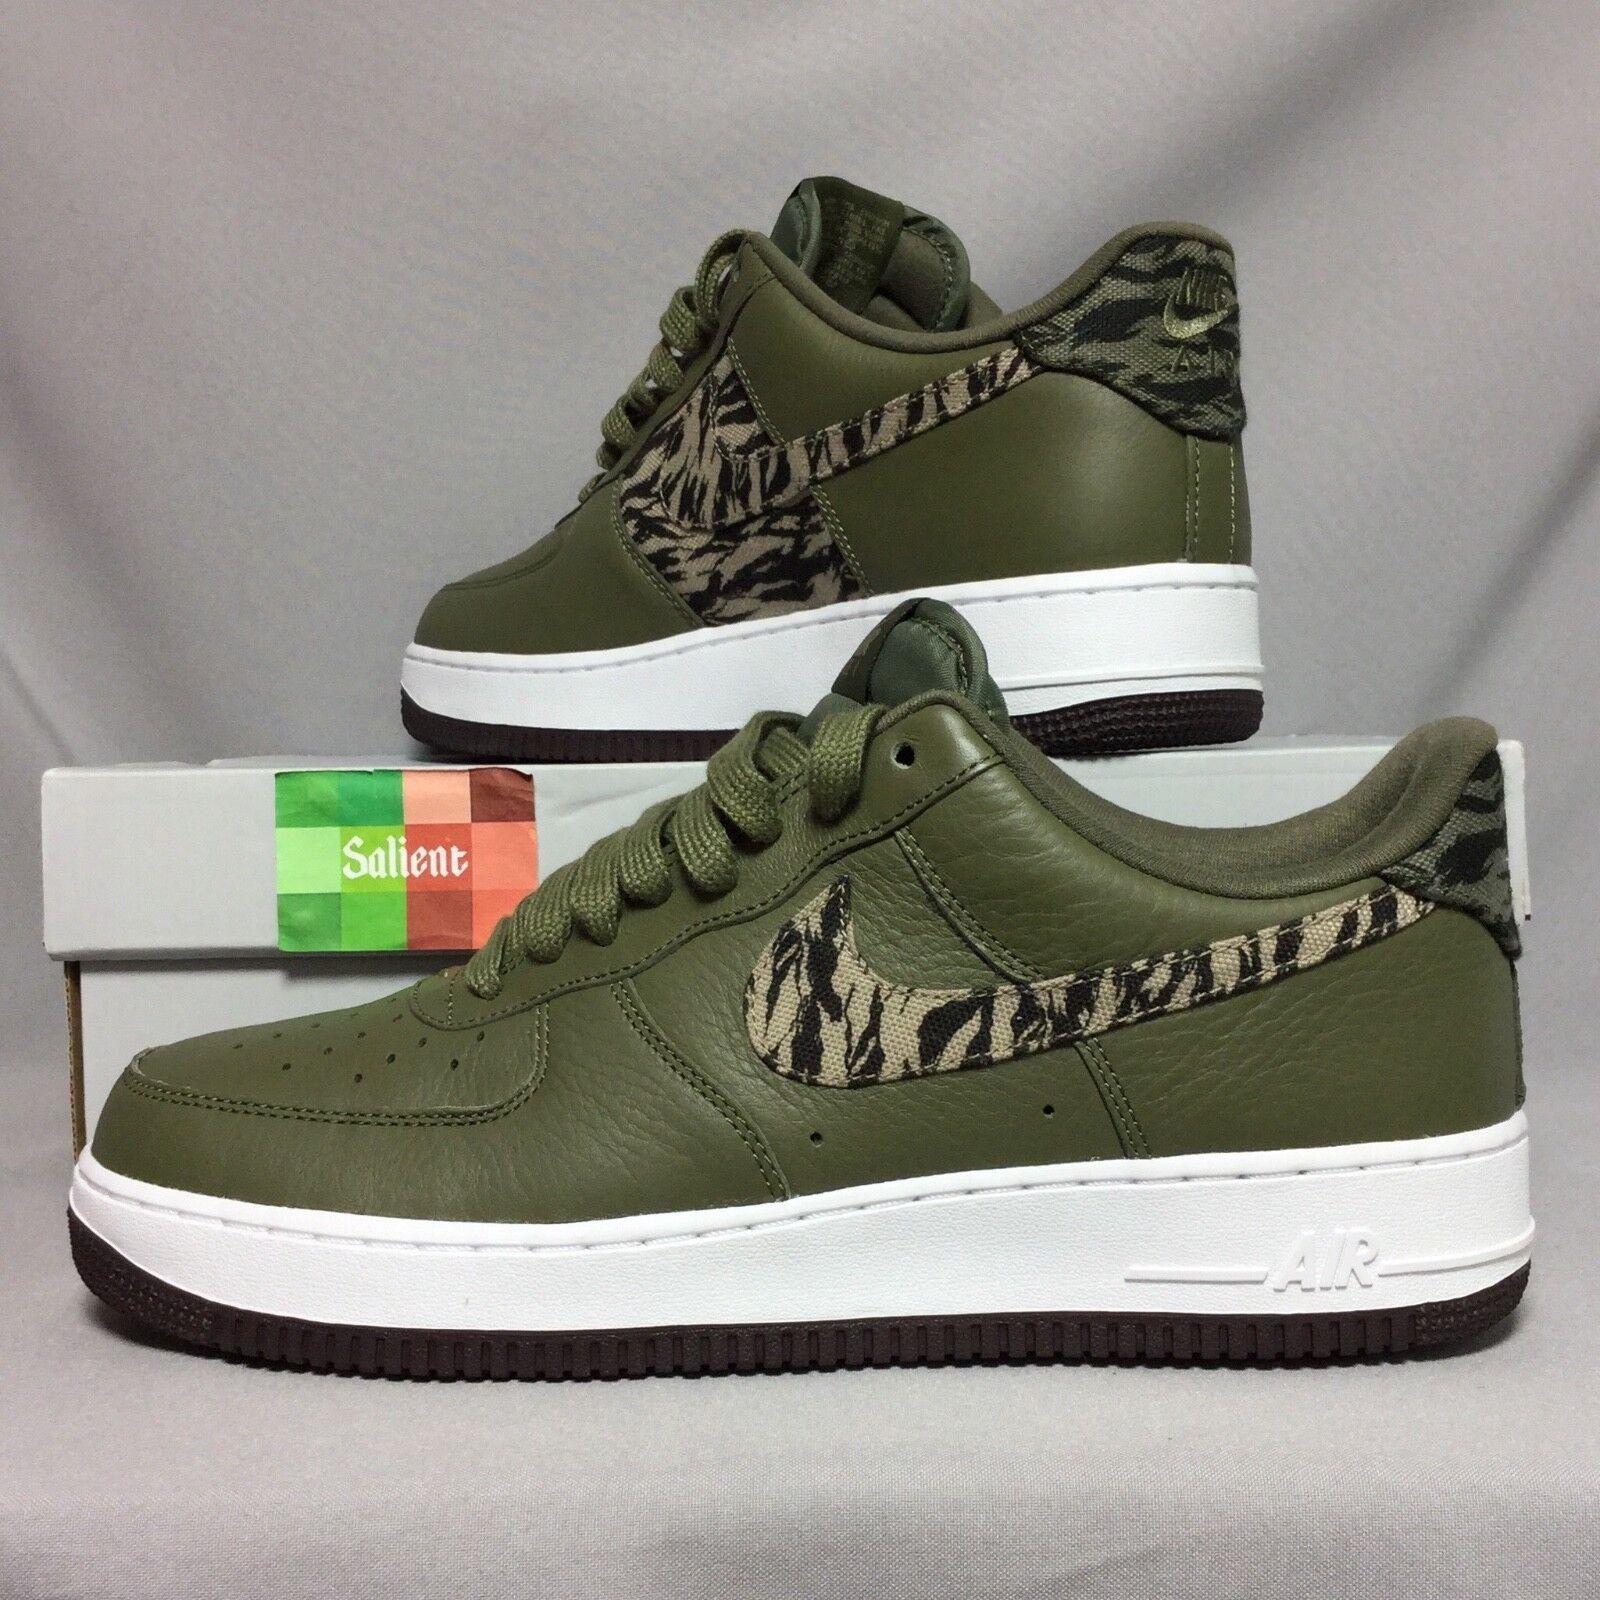 Nike air force 1 aop prm uk10 aq4131-200 camo ersten us11 premium - camouflage army